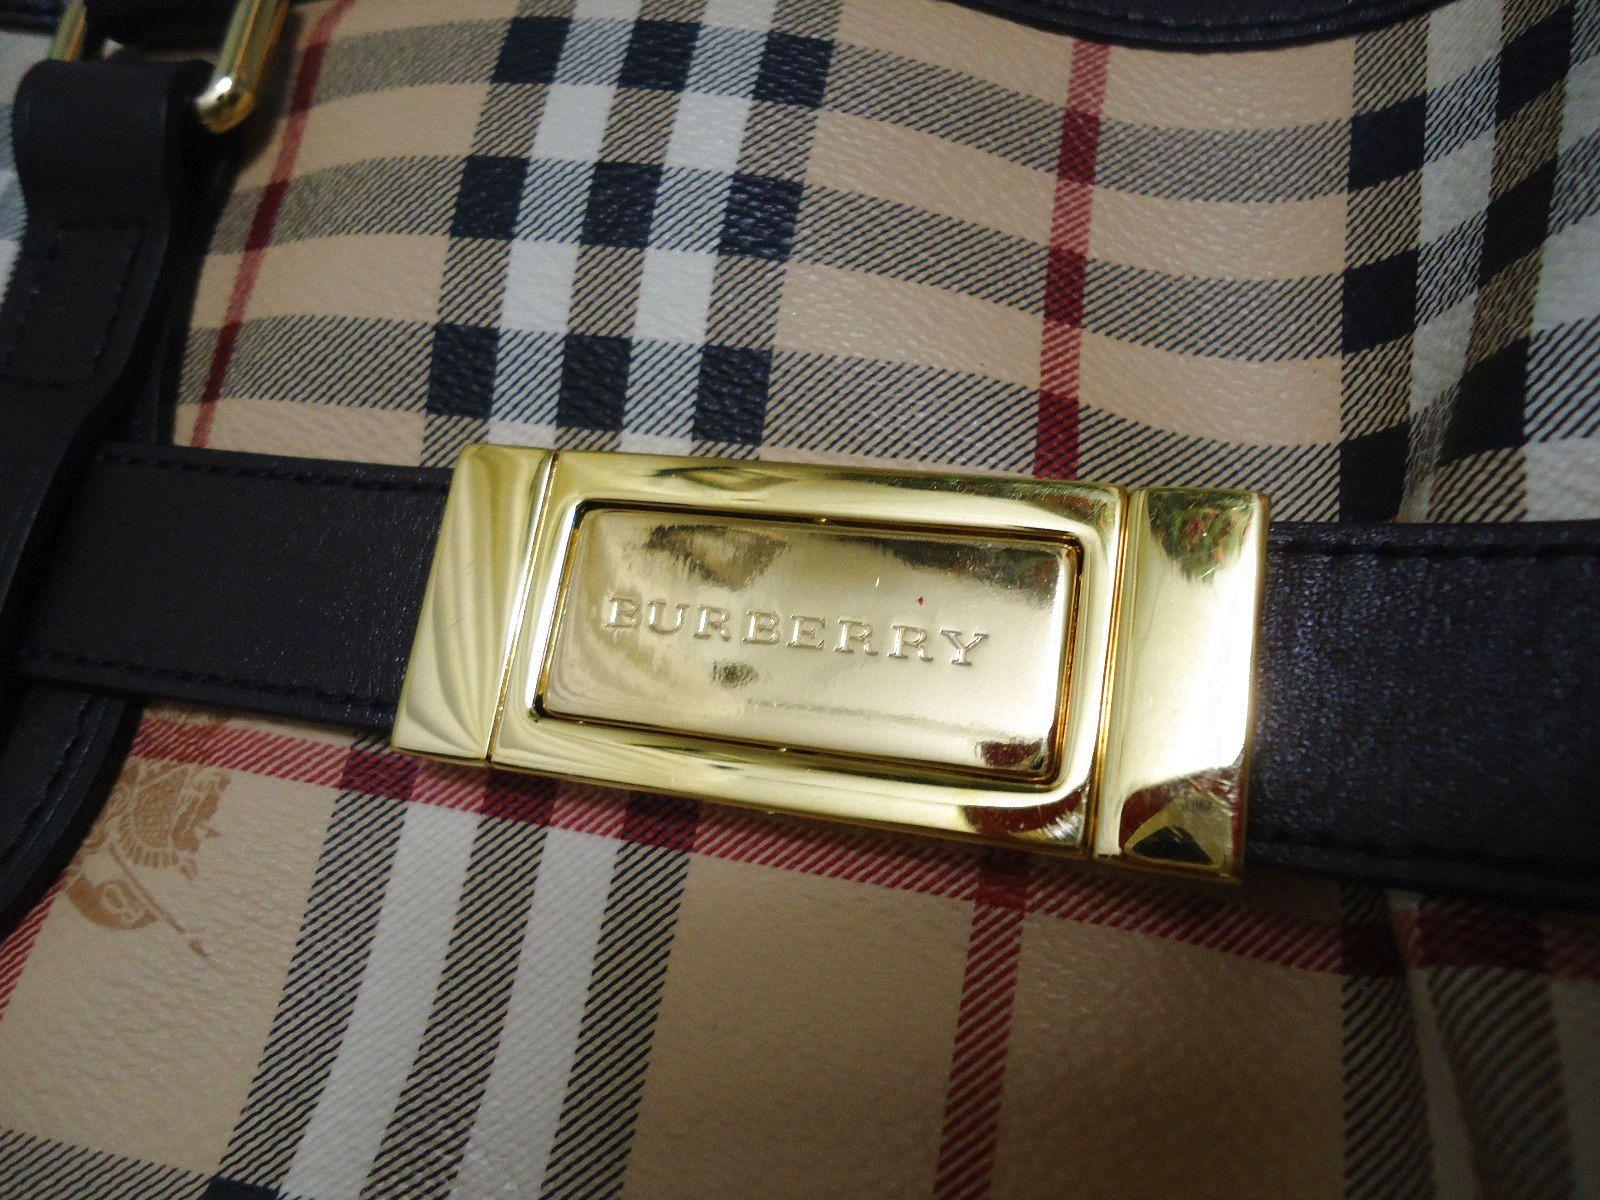 fd571a4008e7 BURBERRY Haymarket Check Medium Golderton Tote  570.0